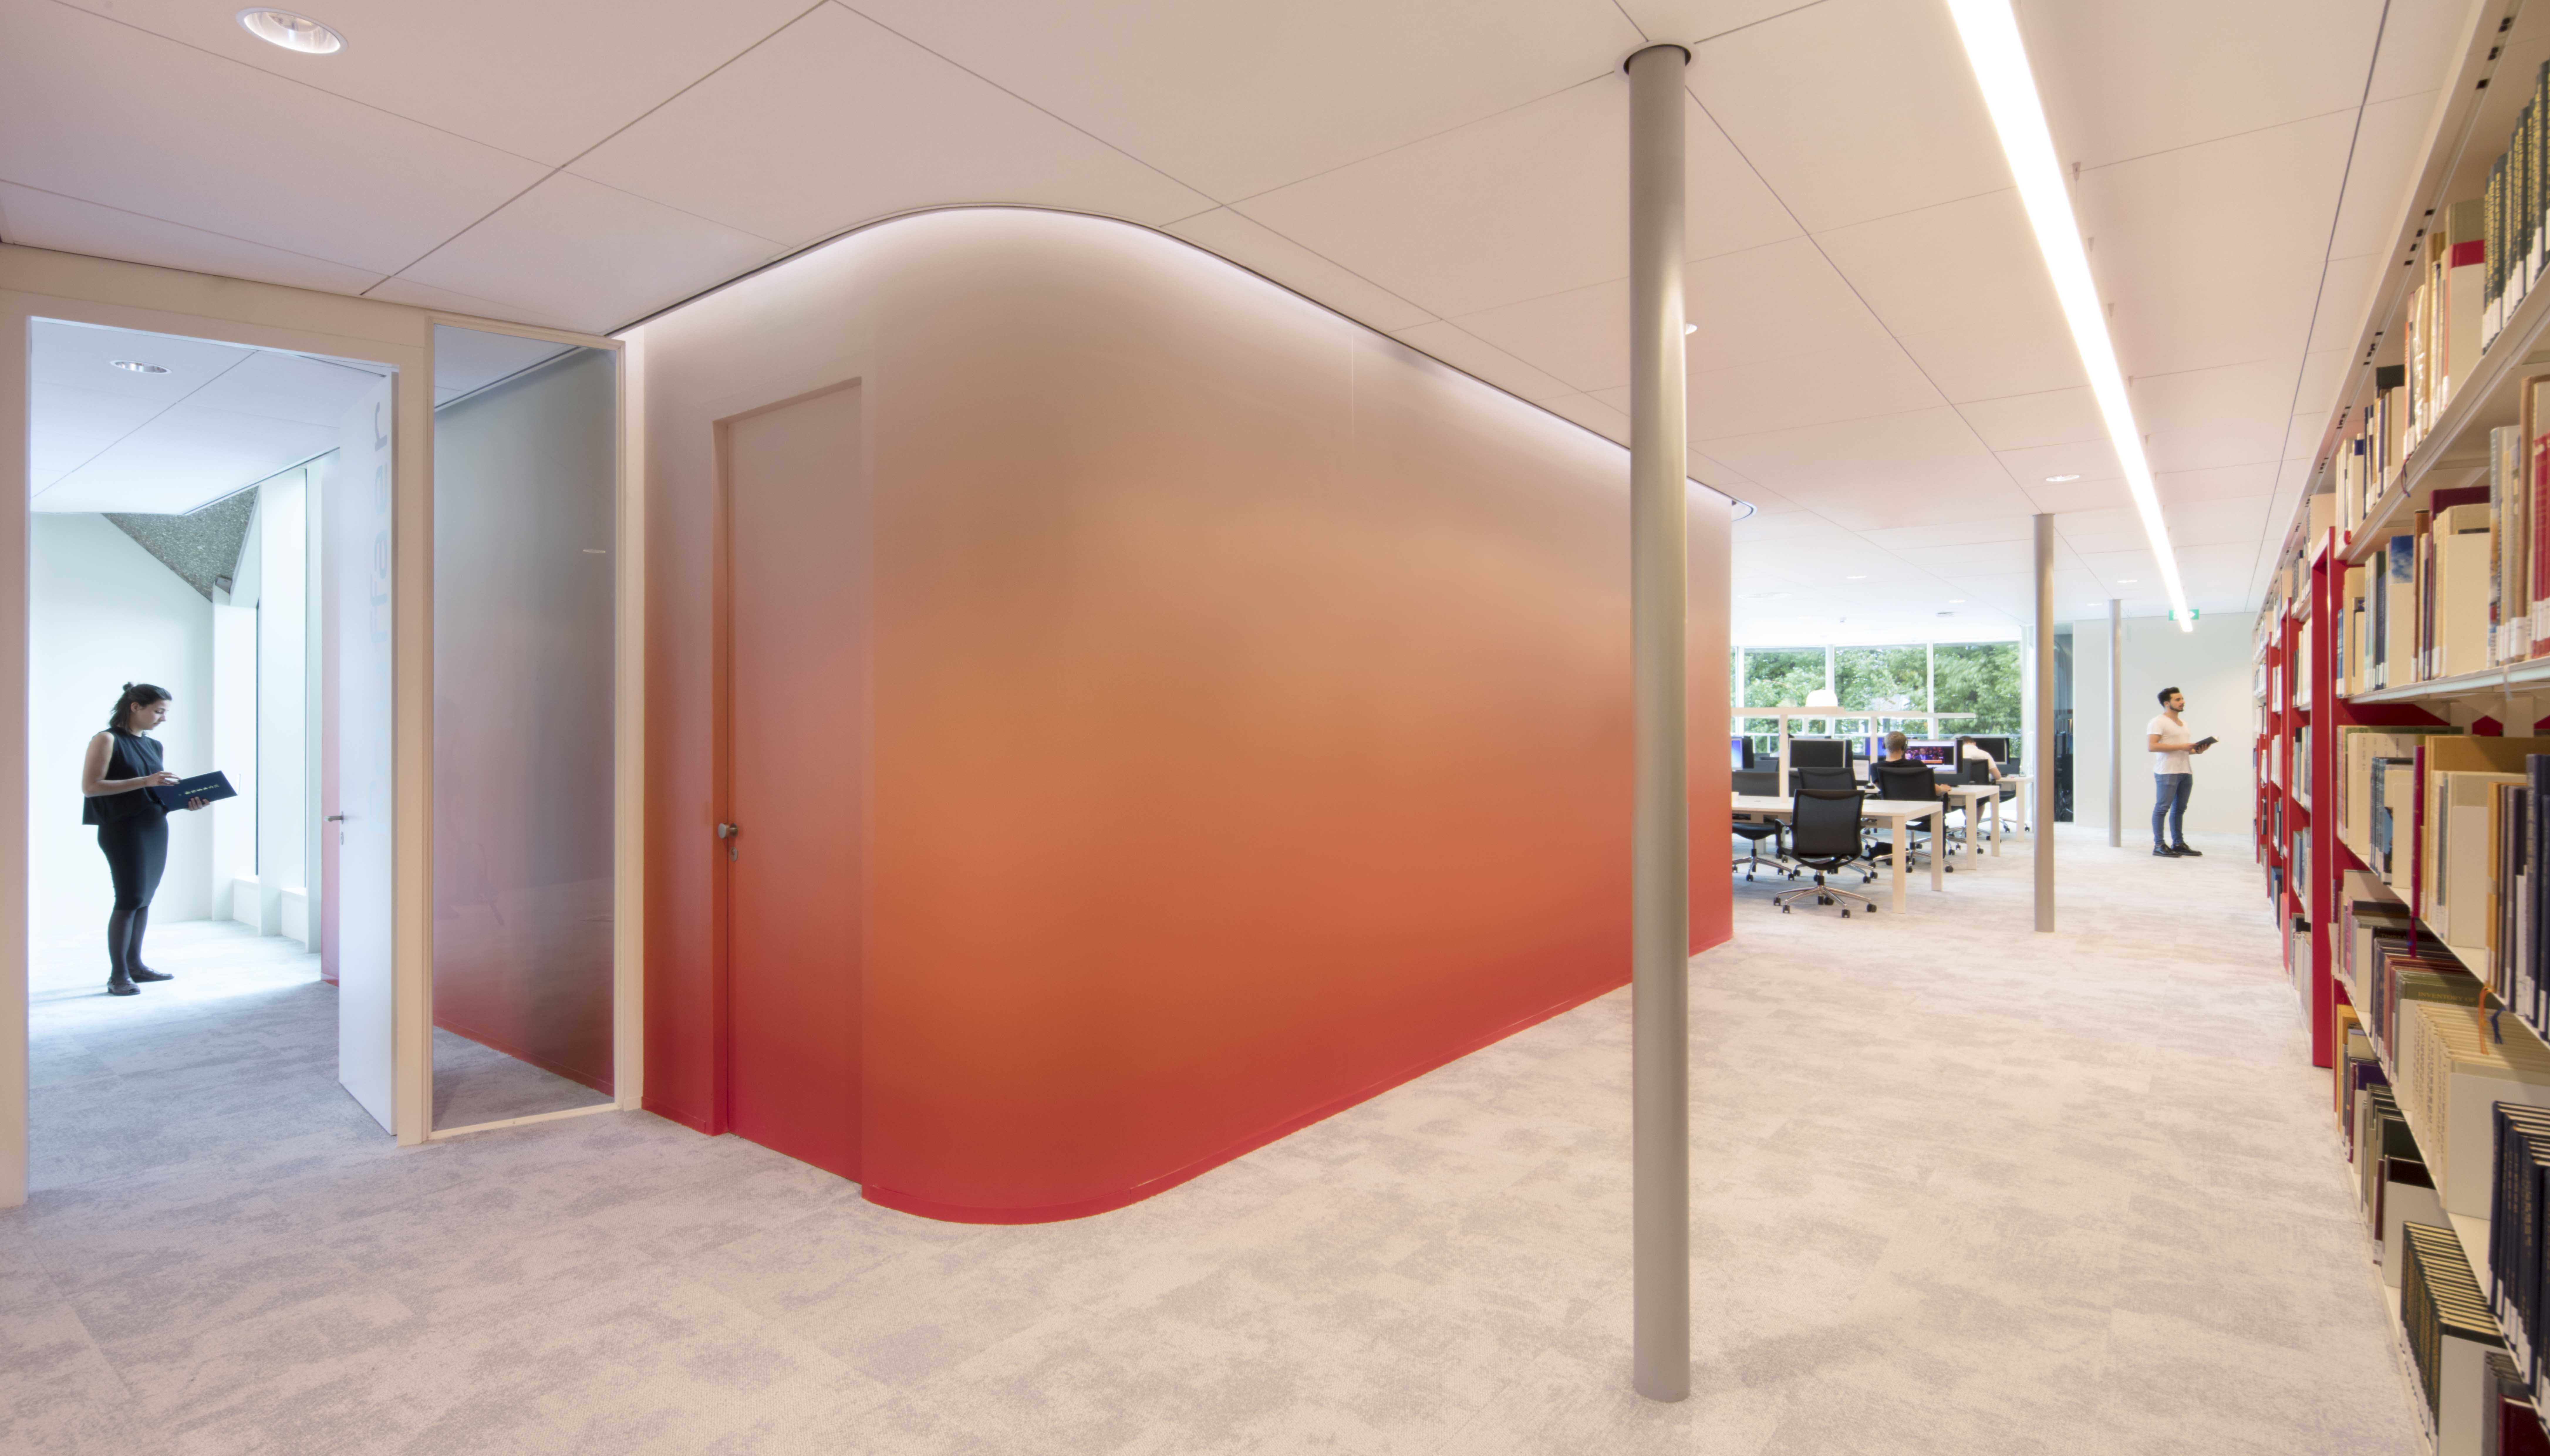 <p>Interieur beeld Asian Library universiteitsbibliotheek Leiden. foto: Jeroen Musch</p>